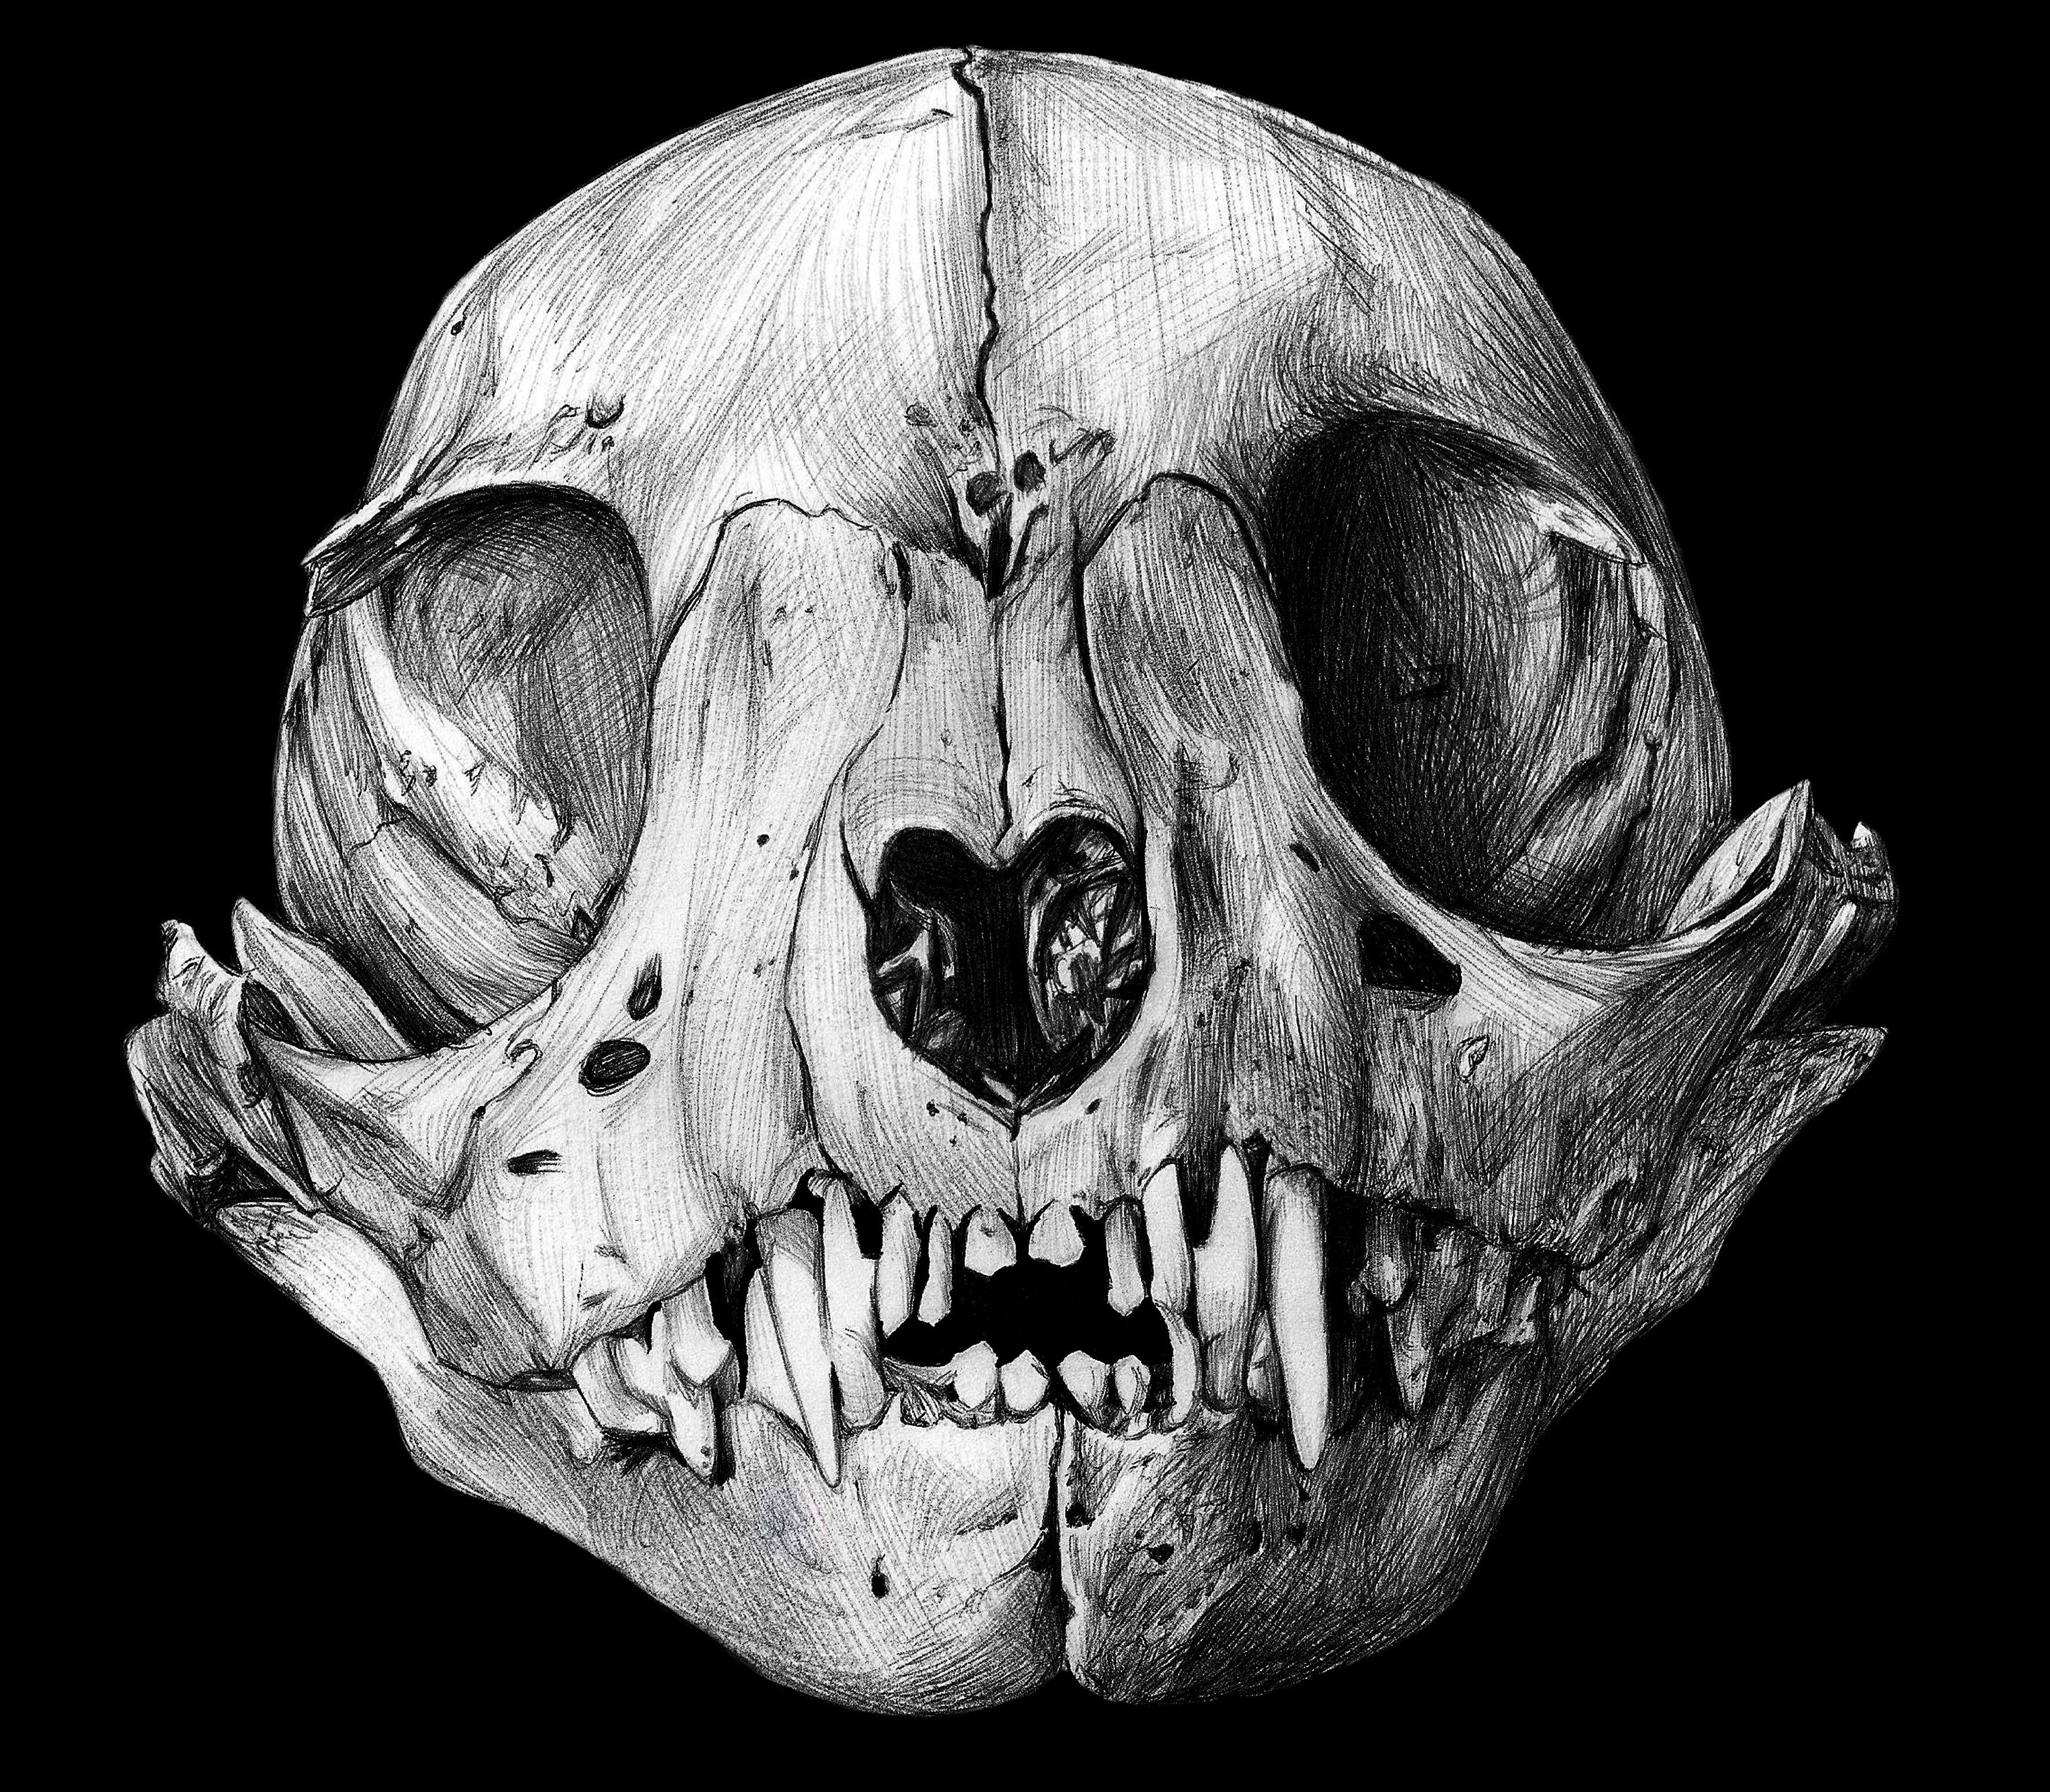 """Skull"" by David Pérez"